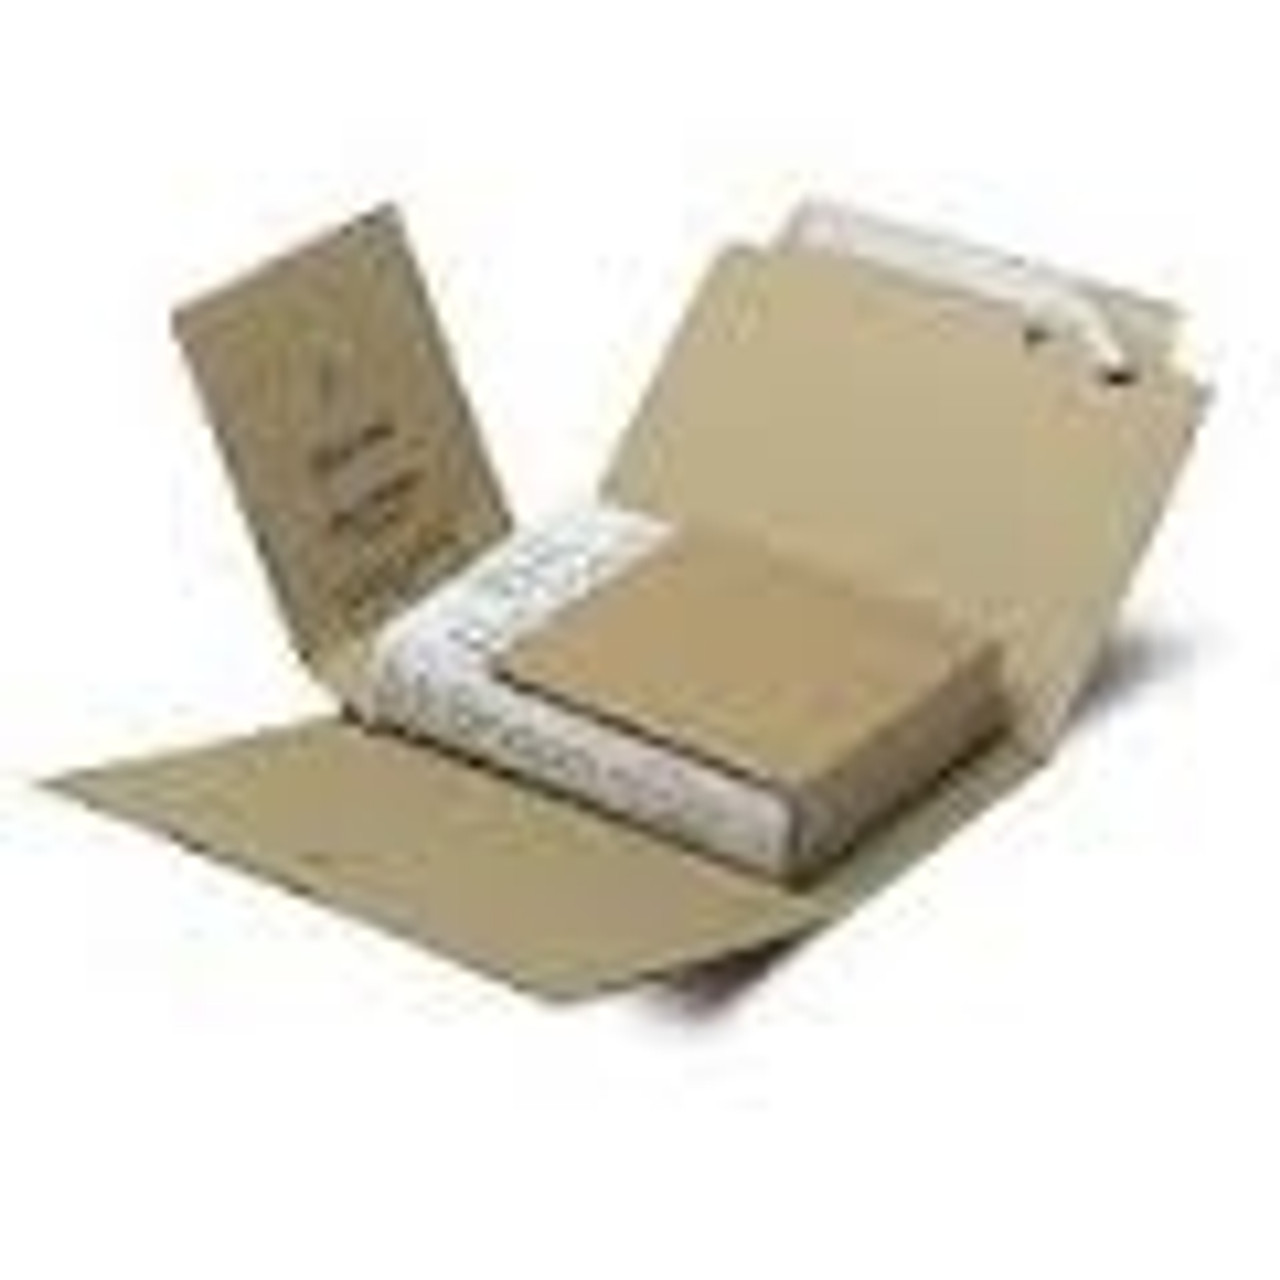 Postal Book Mailers